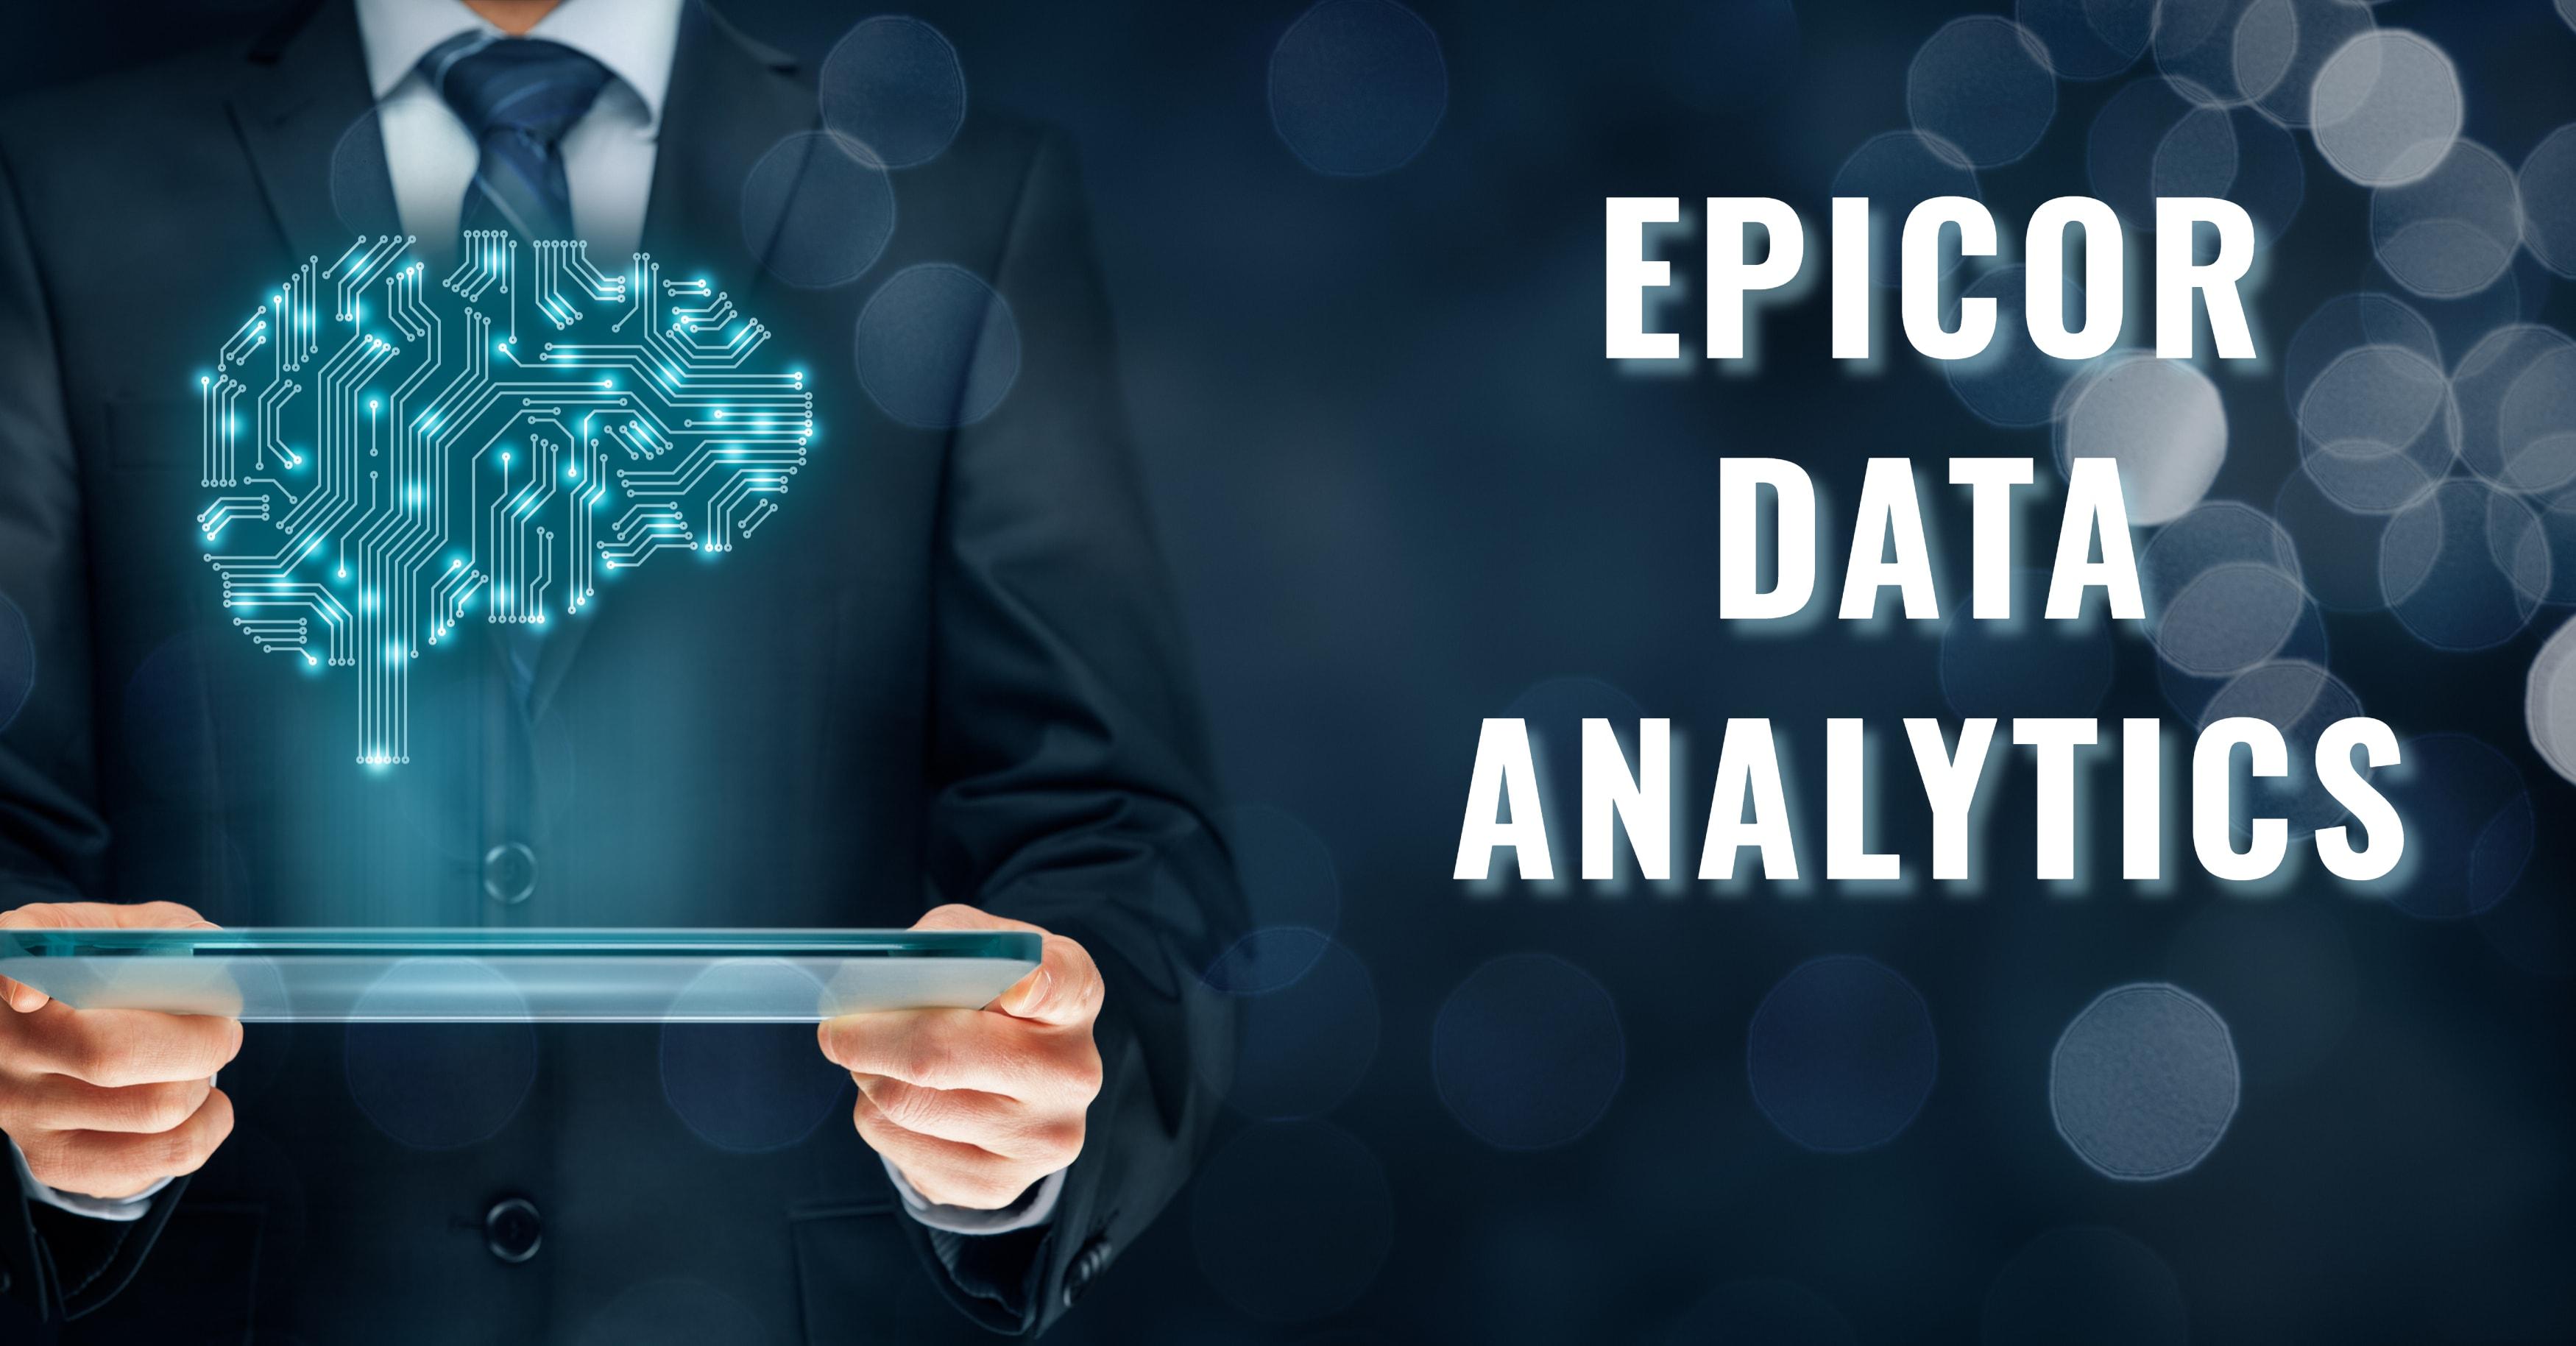 Epicor Data Analytics